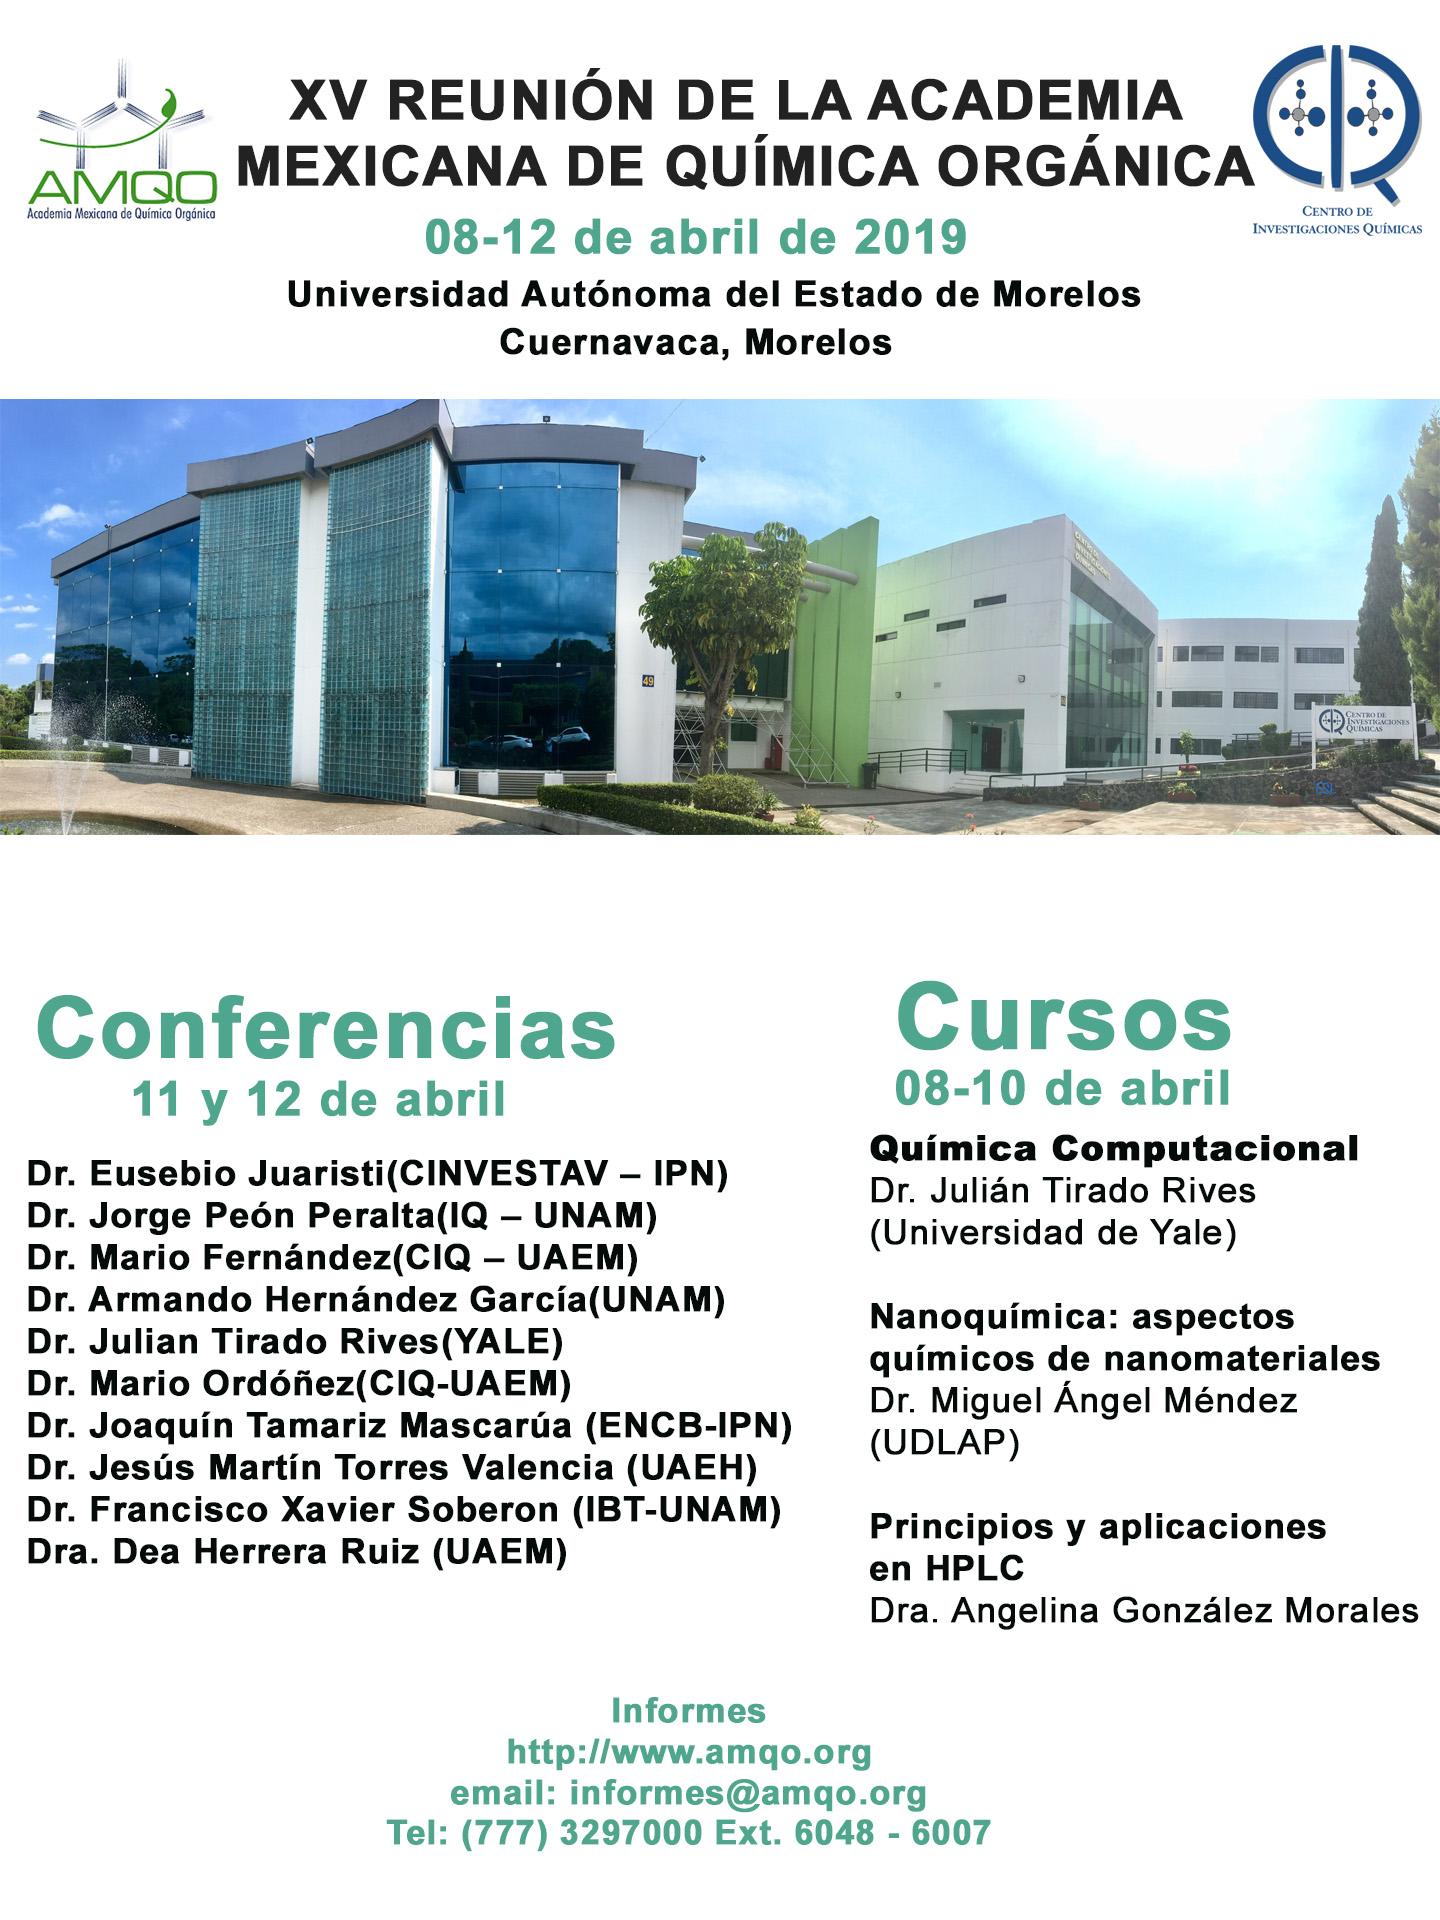 xv-reunion-de-la-academia-mexicana-de-quimica-organica-3-pagina-nueva